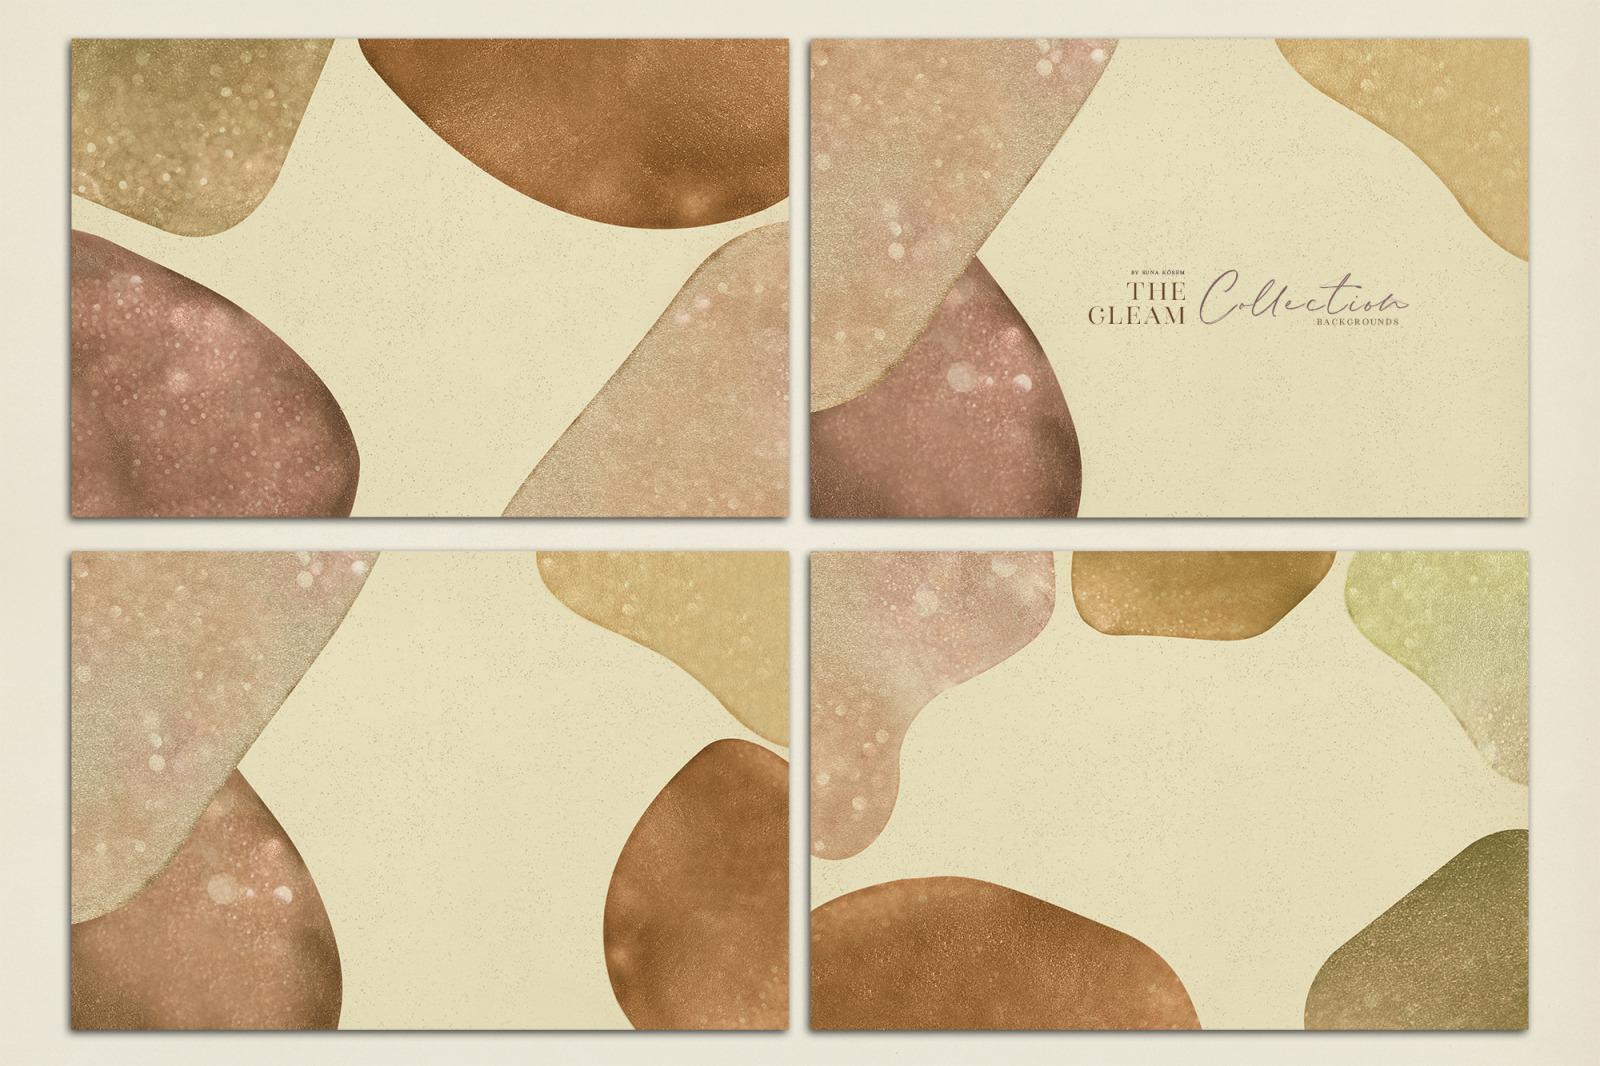 抽象闪闪发光水彩背景图片设计素材 The Gleam Watercolor Shapes插图7